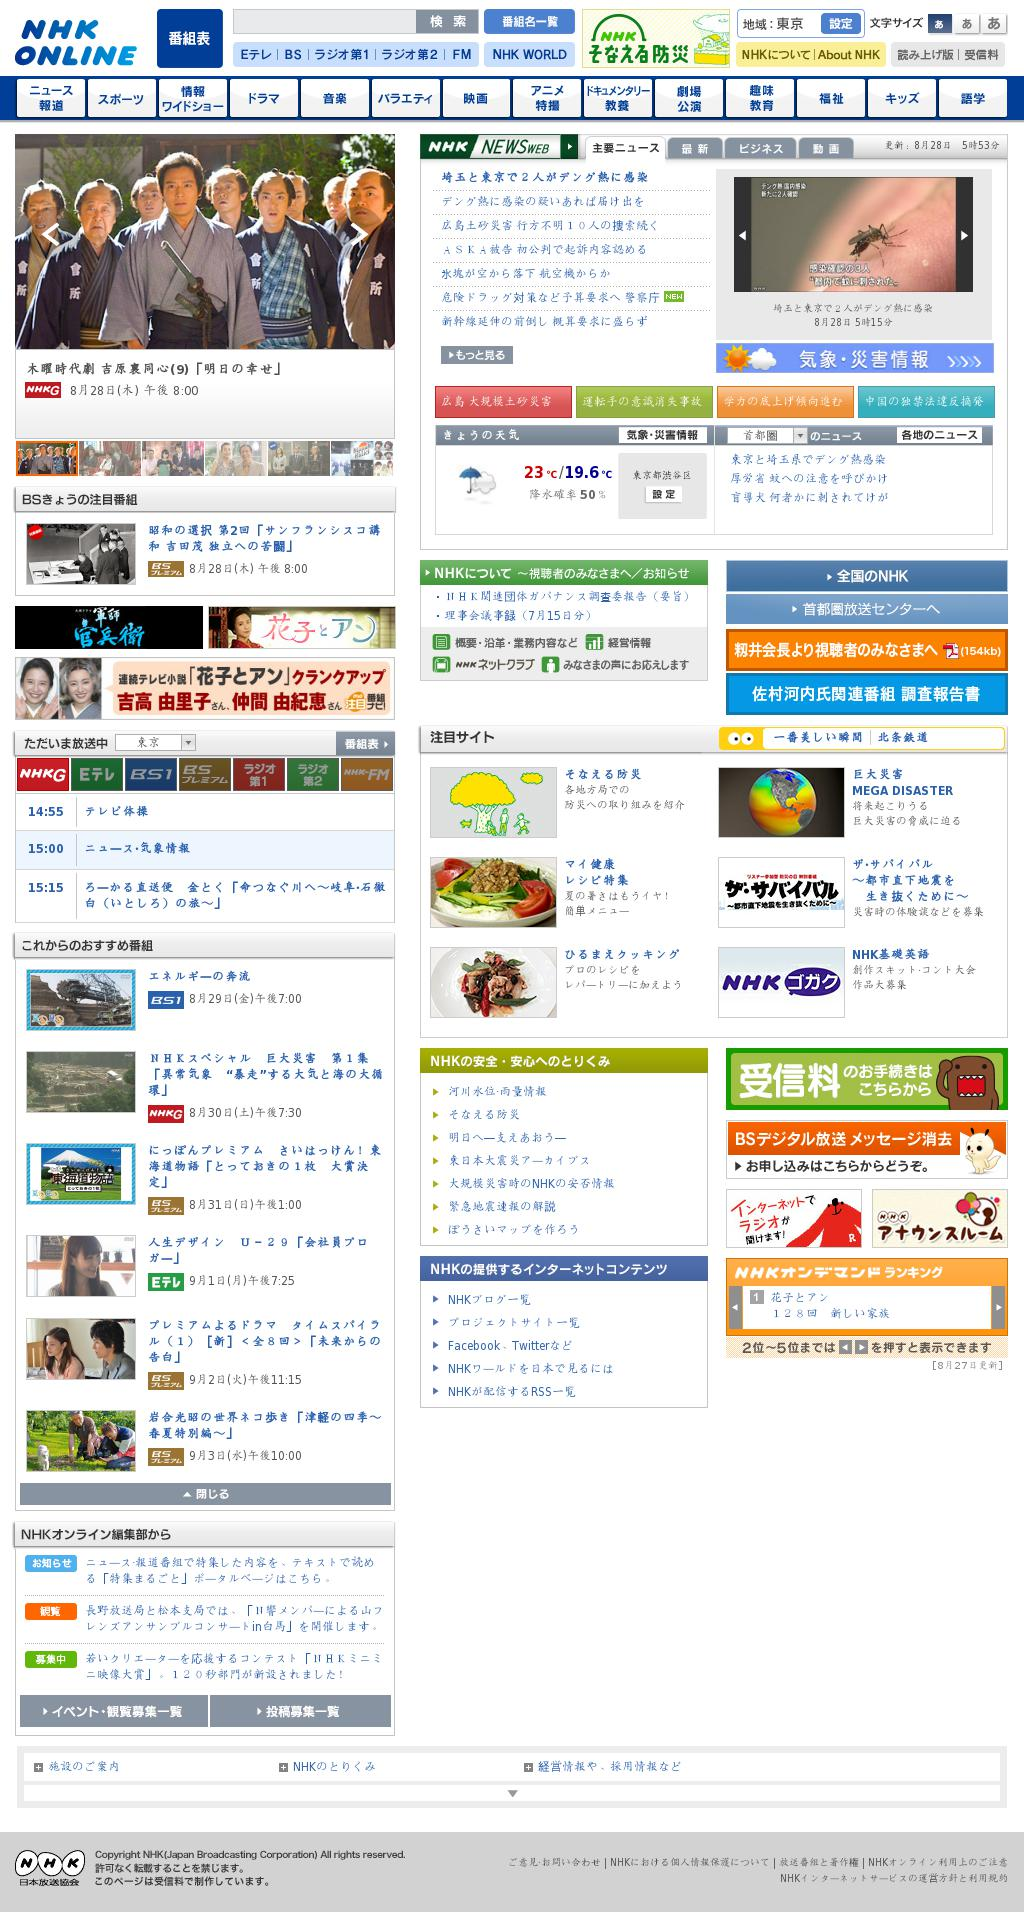 NHK Online at Thursday Aug. 28, 2014, 6:14 a.m. UTC